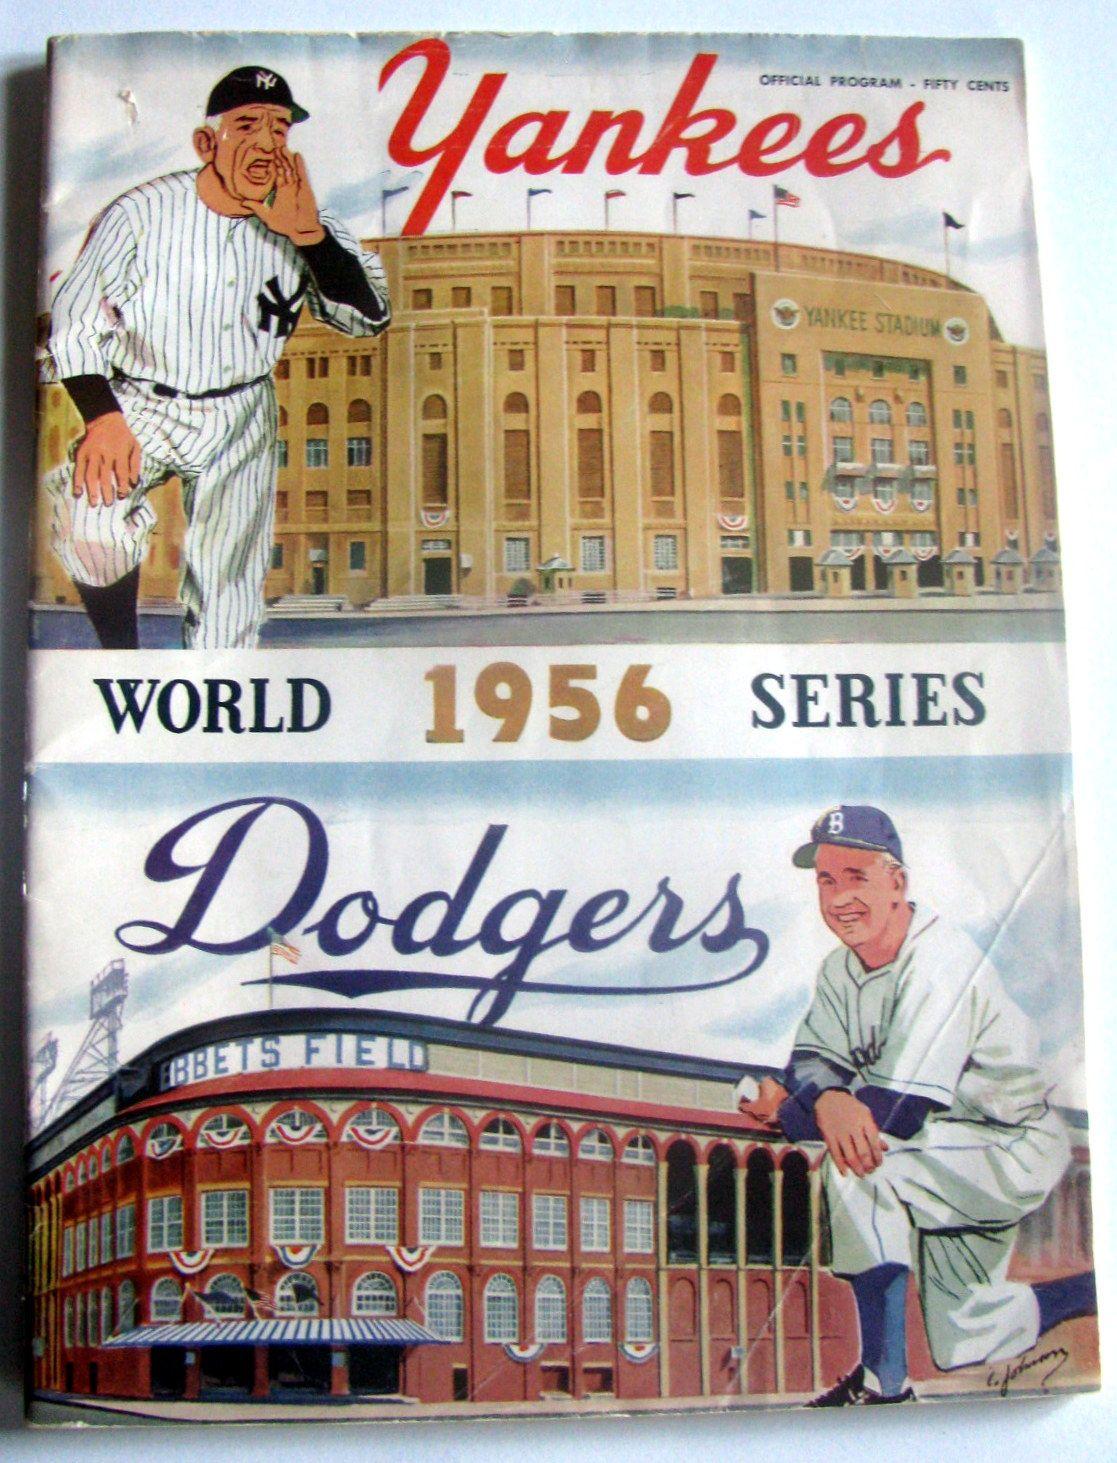 1956 World Series